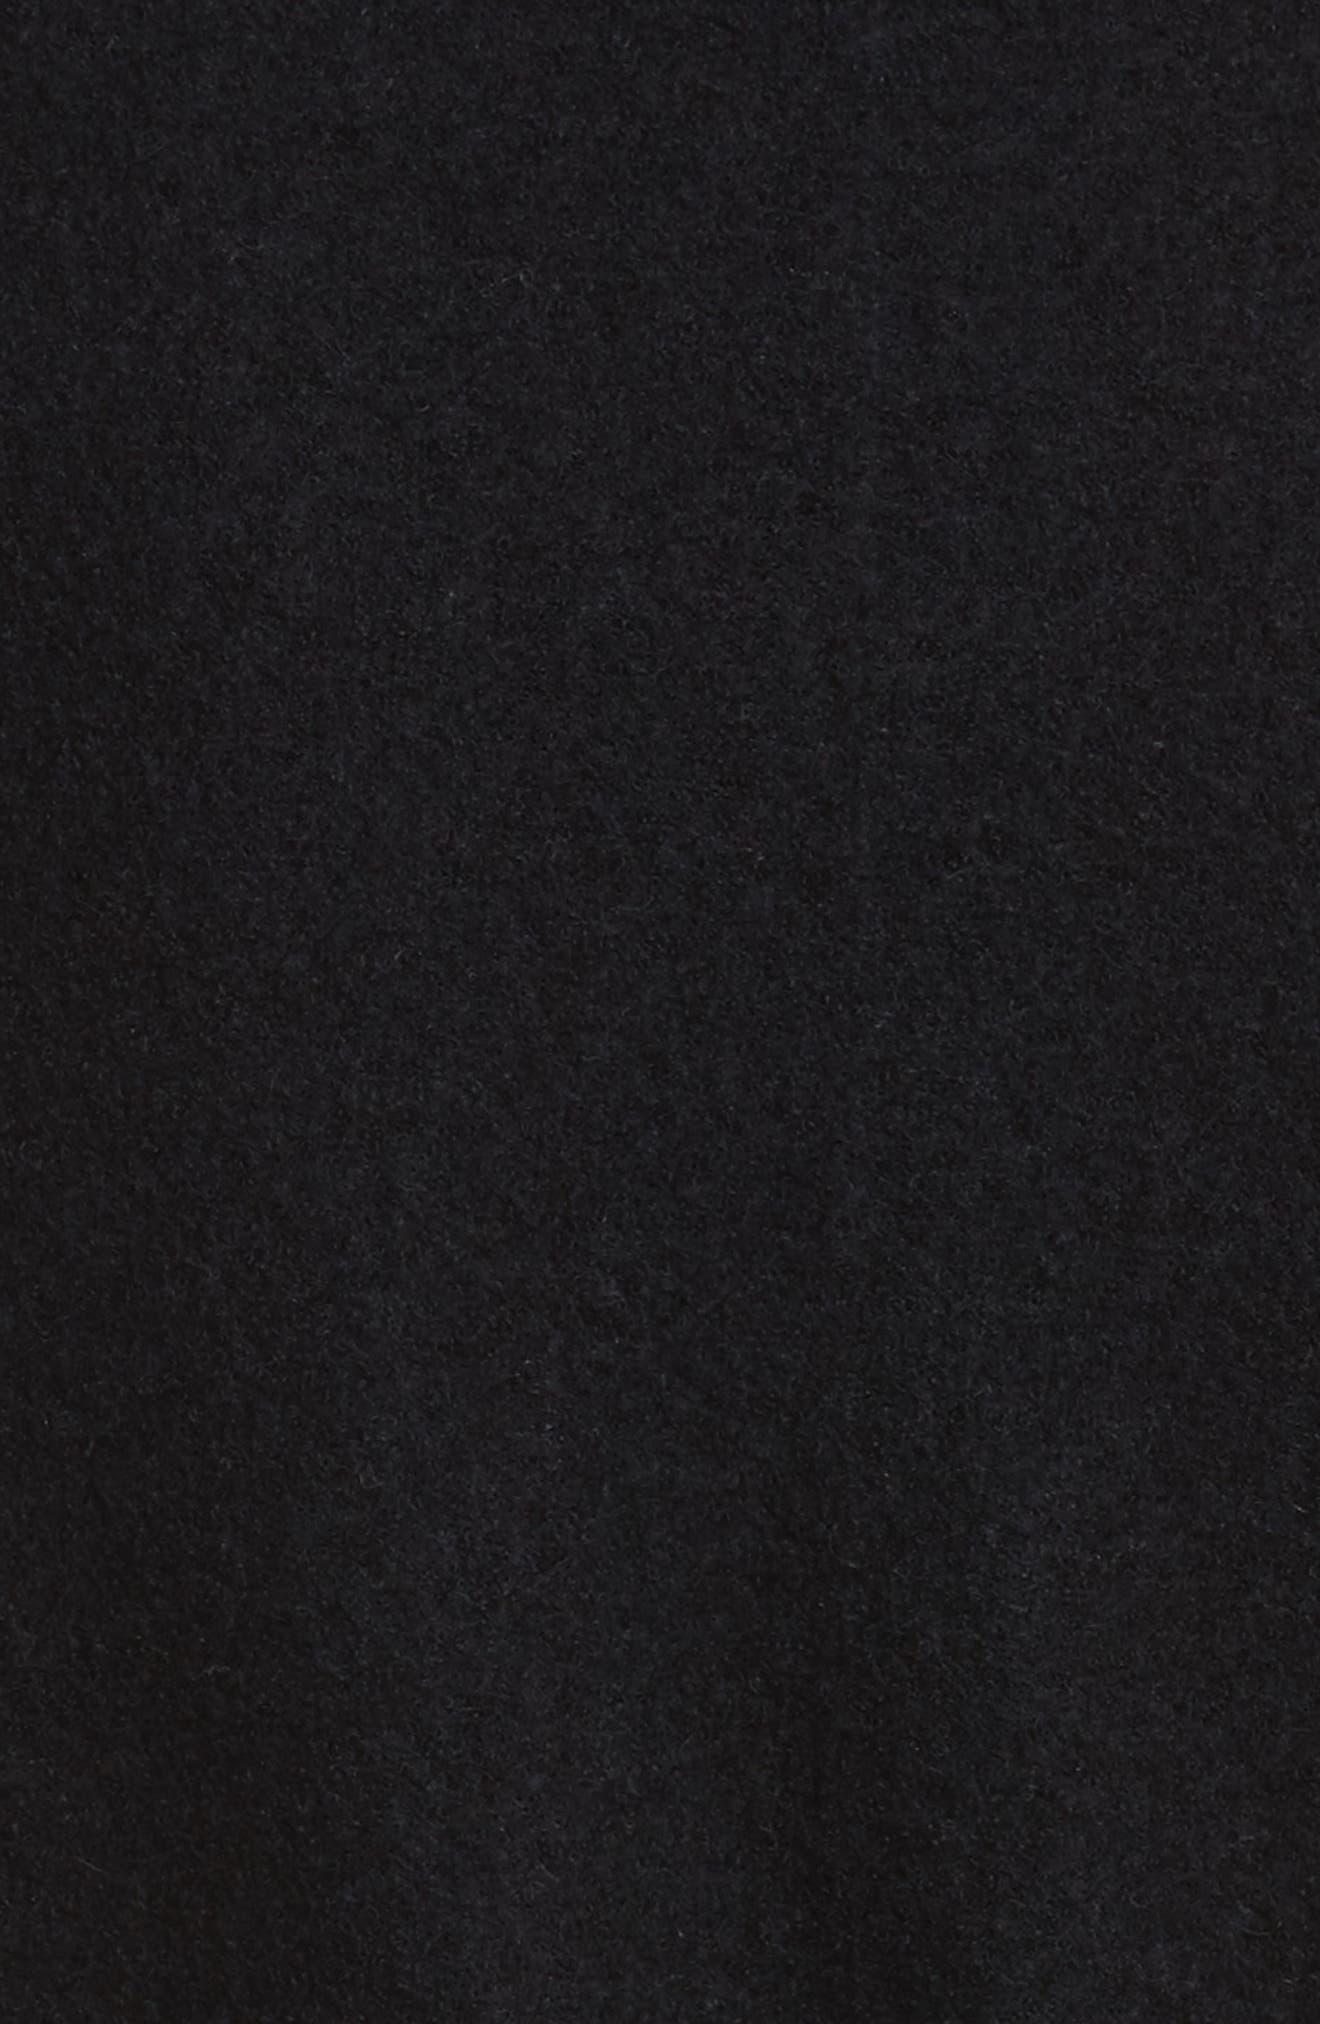 Side Slit Long Cardigan,                             Alternate thumbnail 5, color,                             001